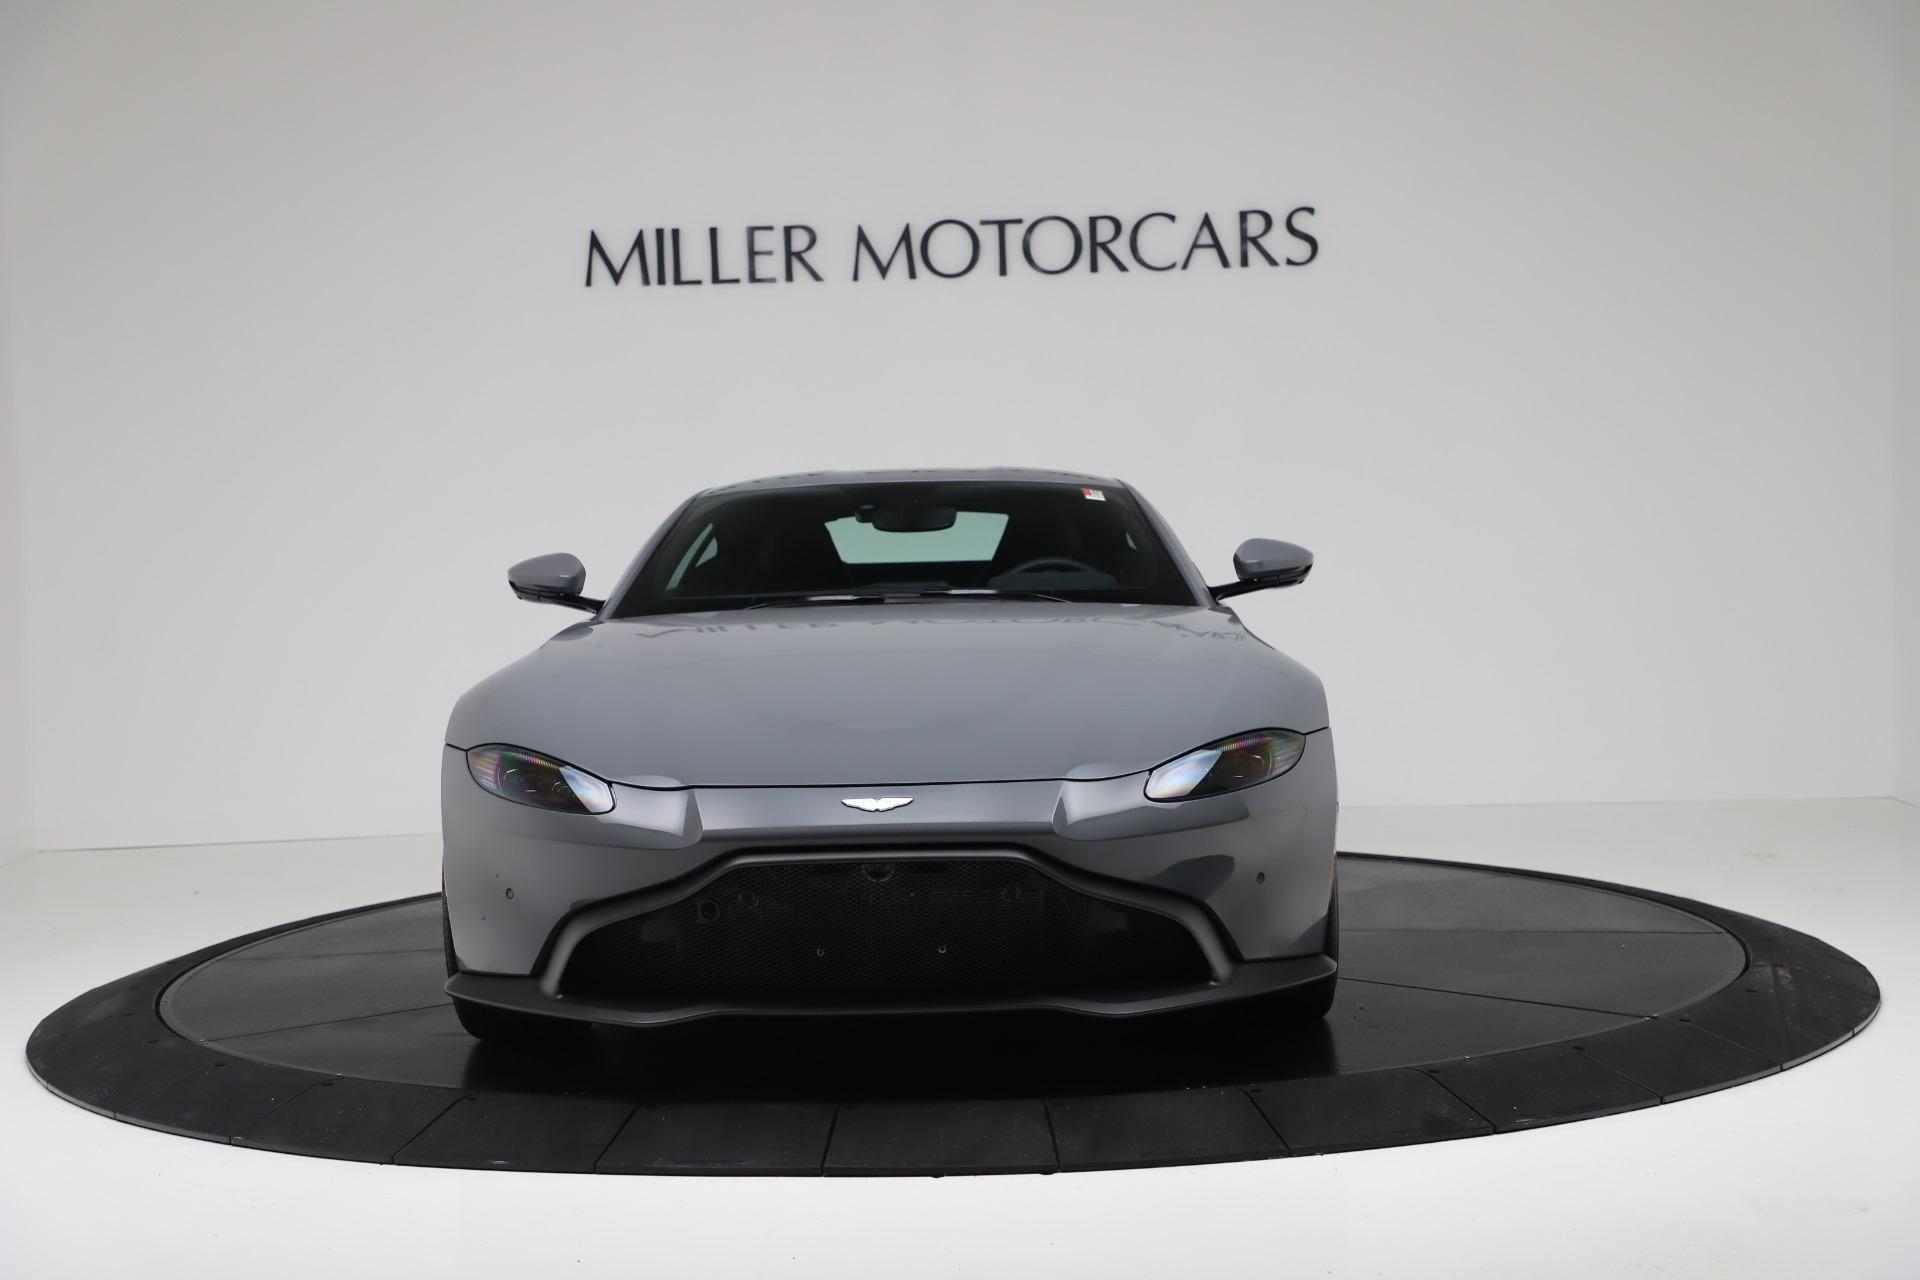 New 2020 Aston Martin Vantage V8 For Sale In Westport, CT 3368_p8